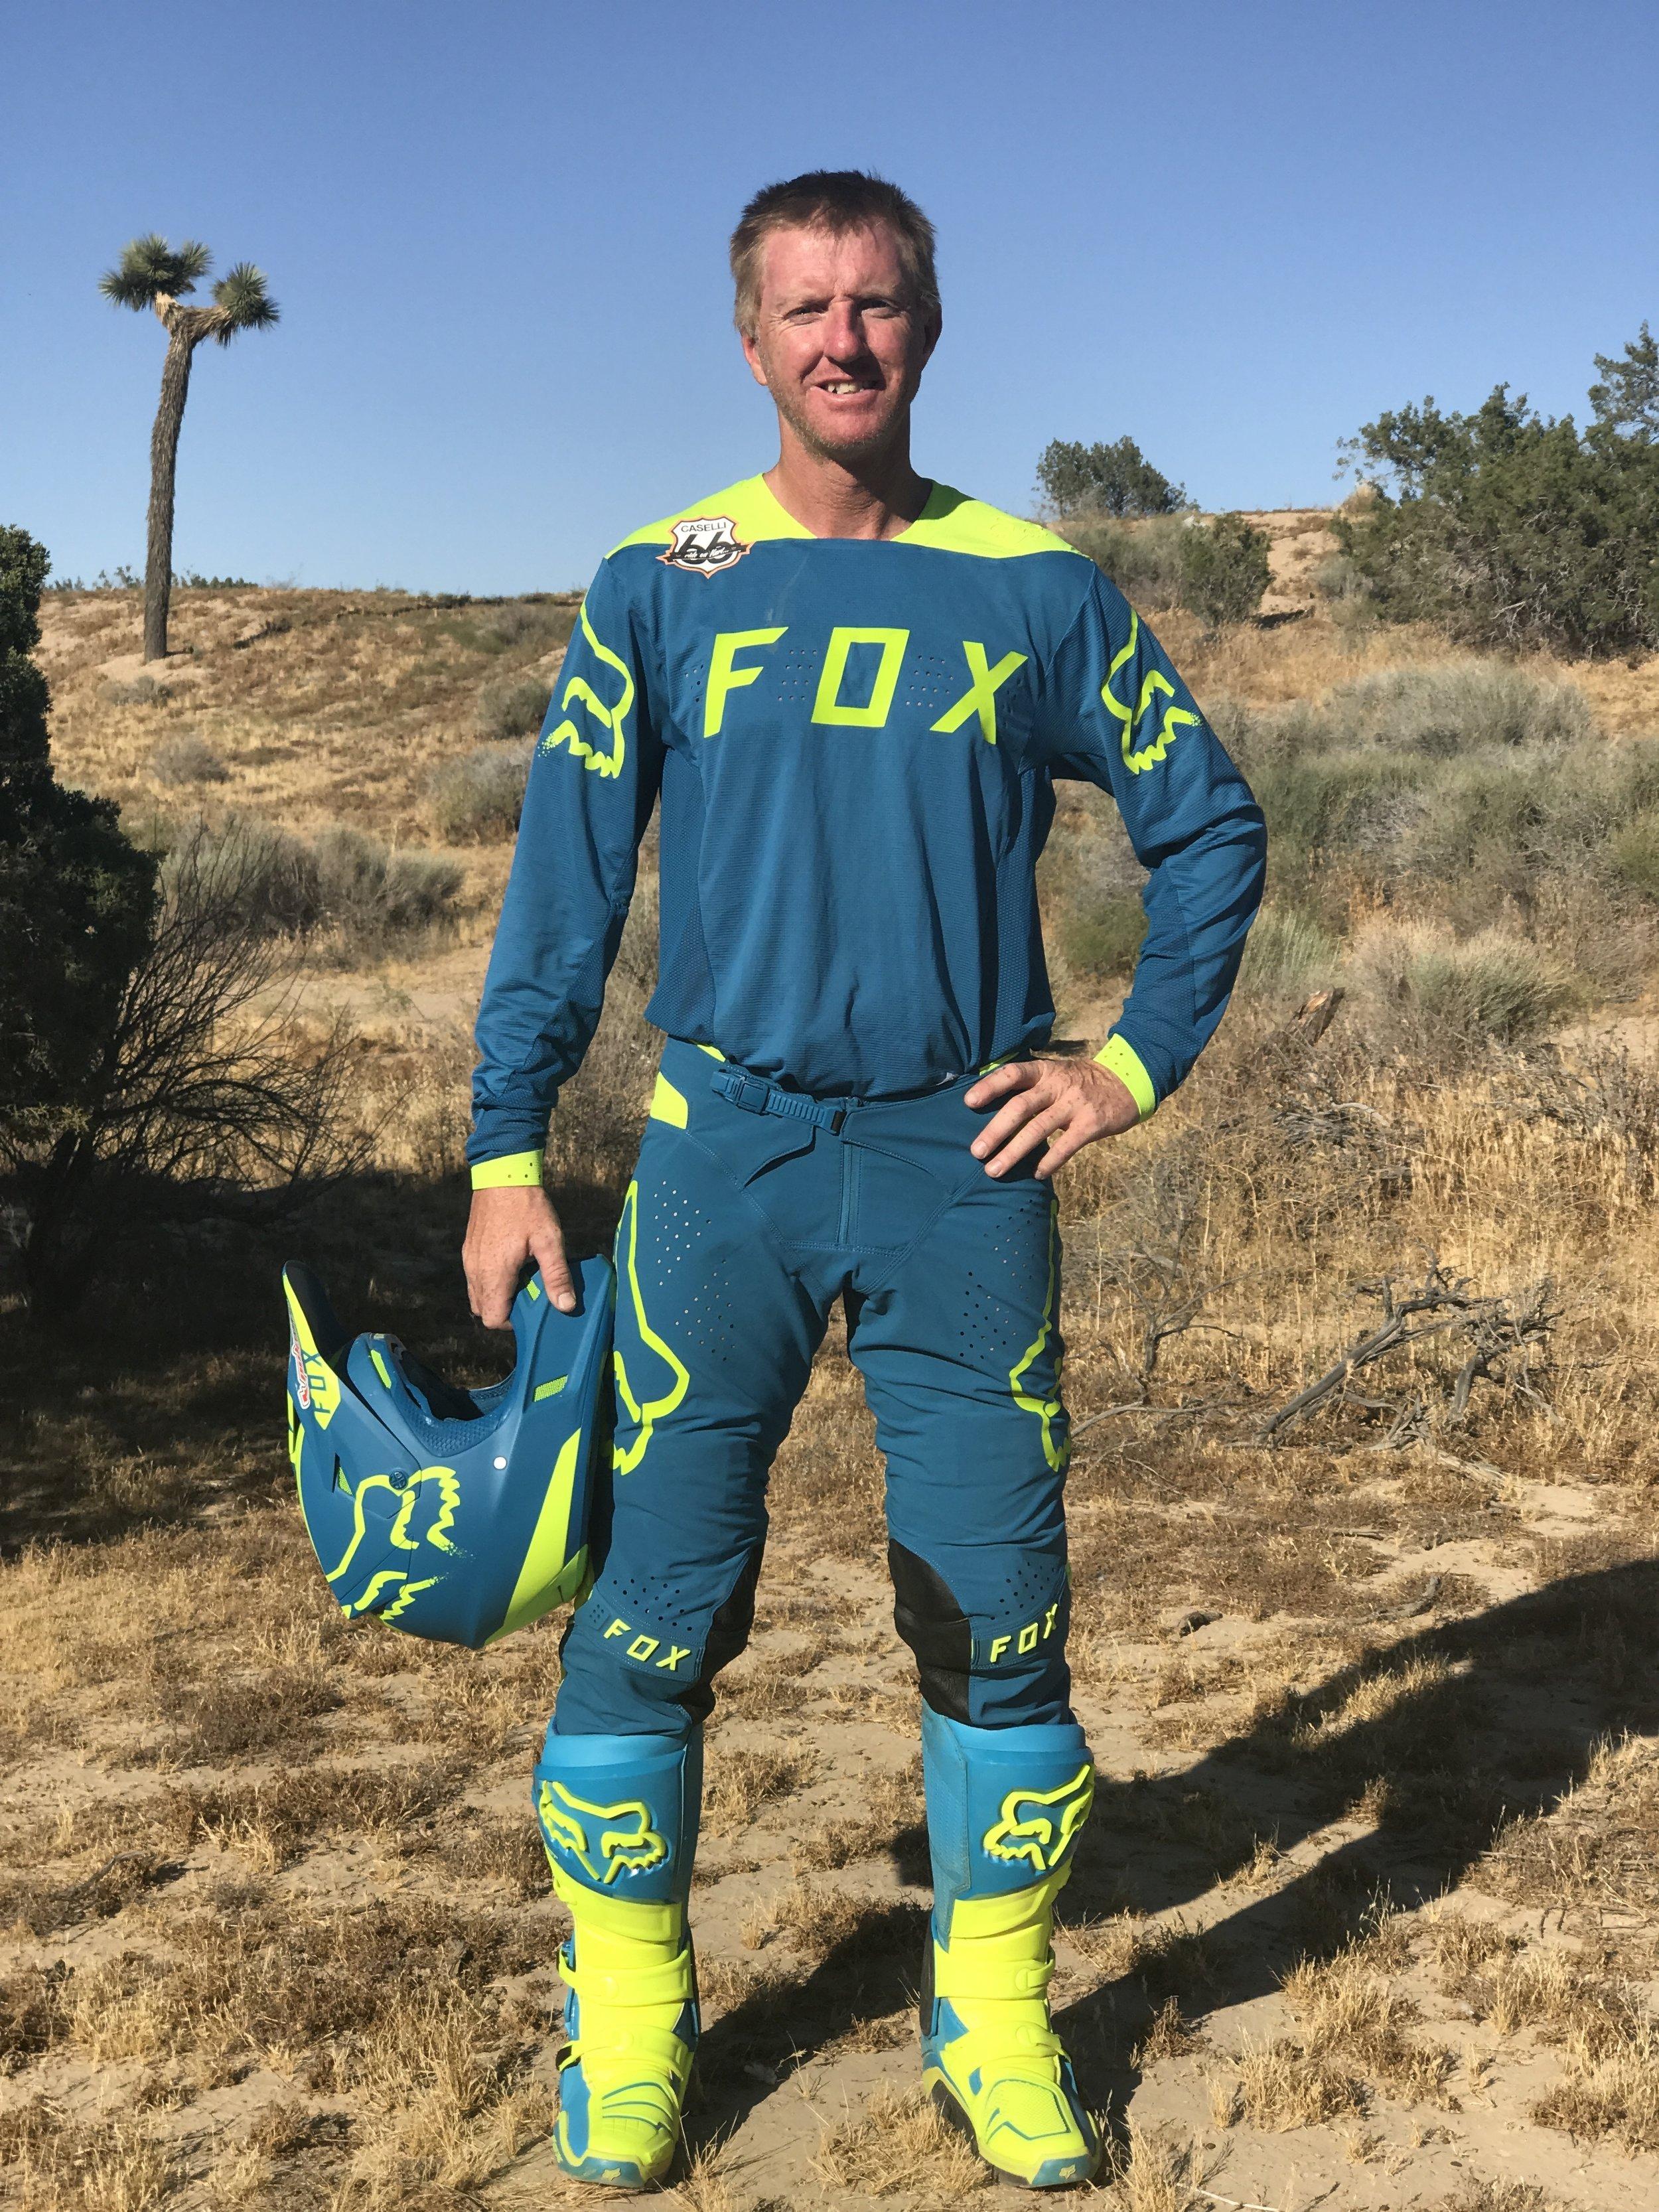 FOX RACING FLEXAIR MOTH LE MOTOCROSS// ENDURO //OFF ROAD